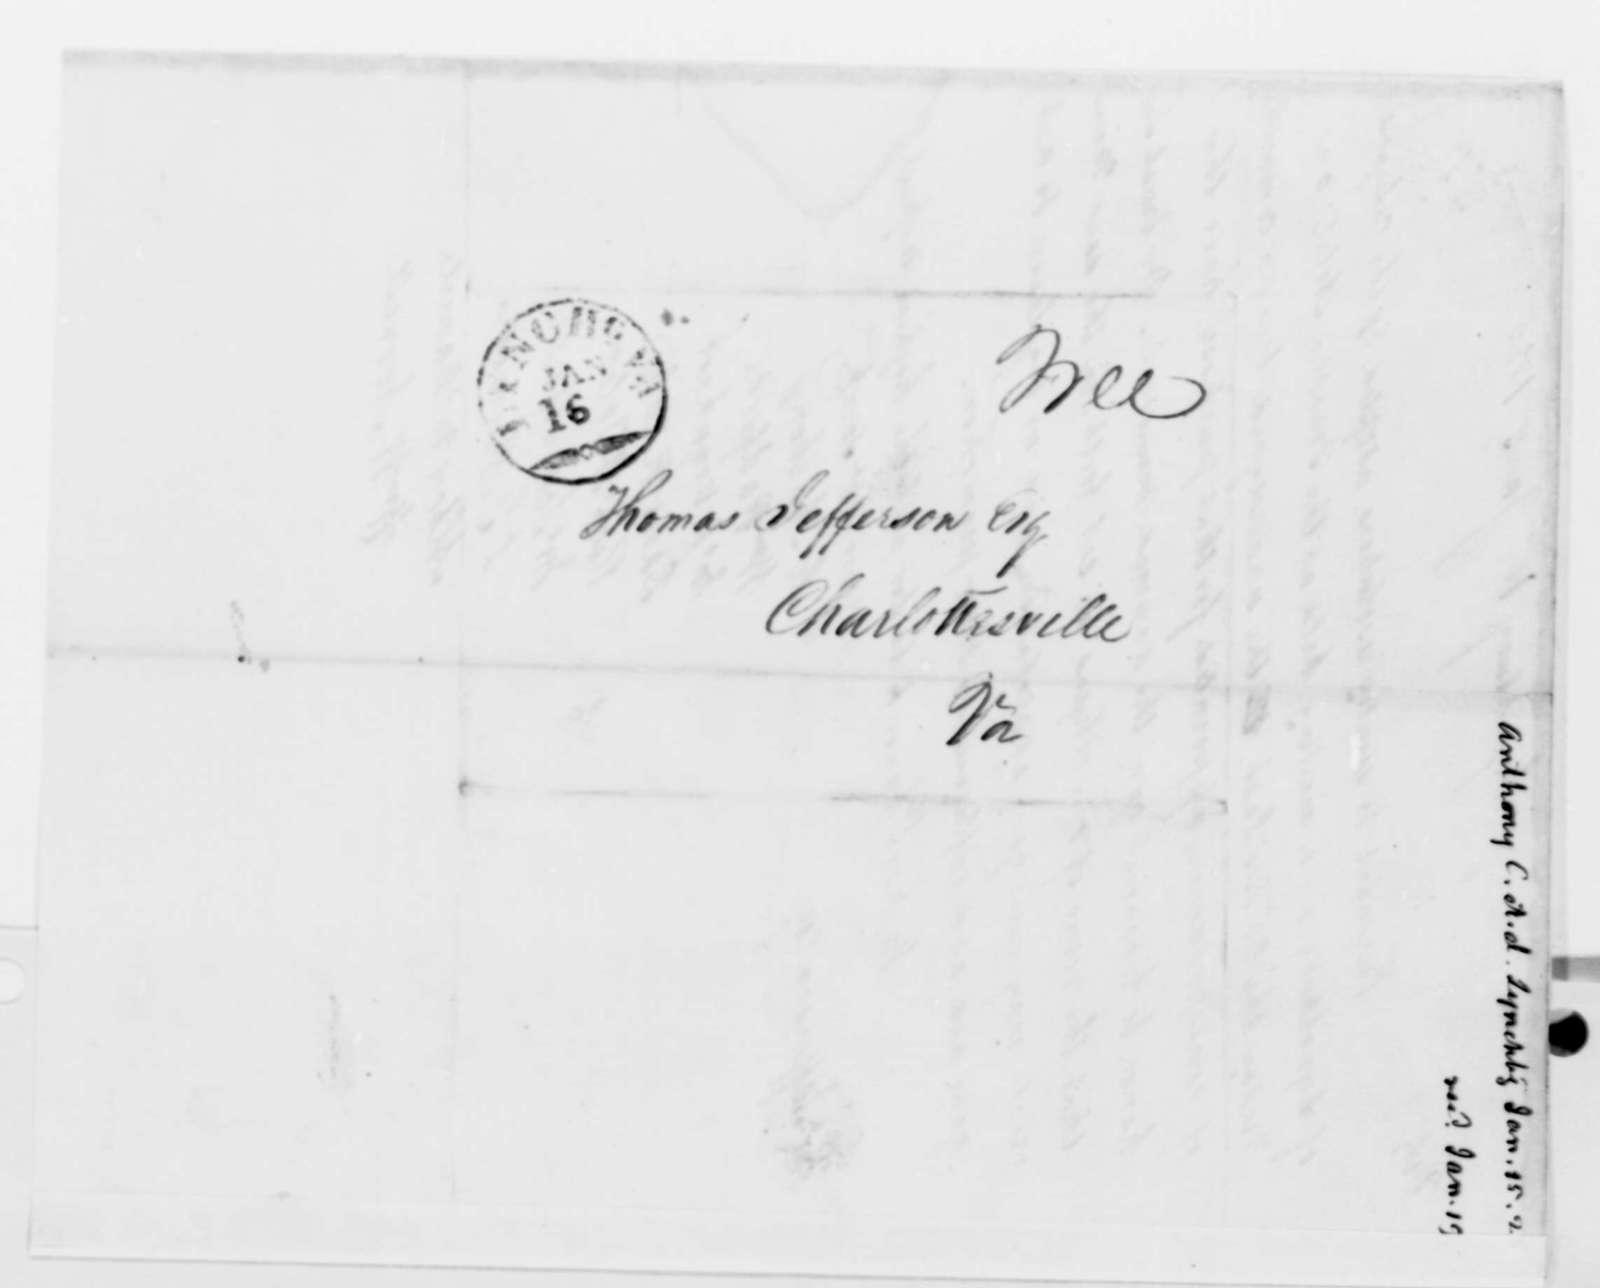 C. Anthony, et al to Thomas Jefferson, January 15, 1825